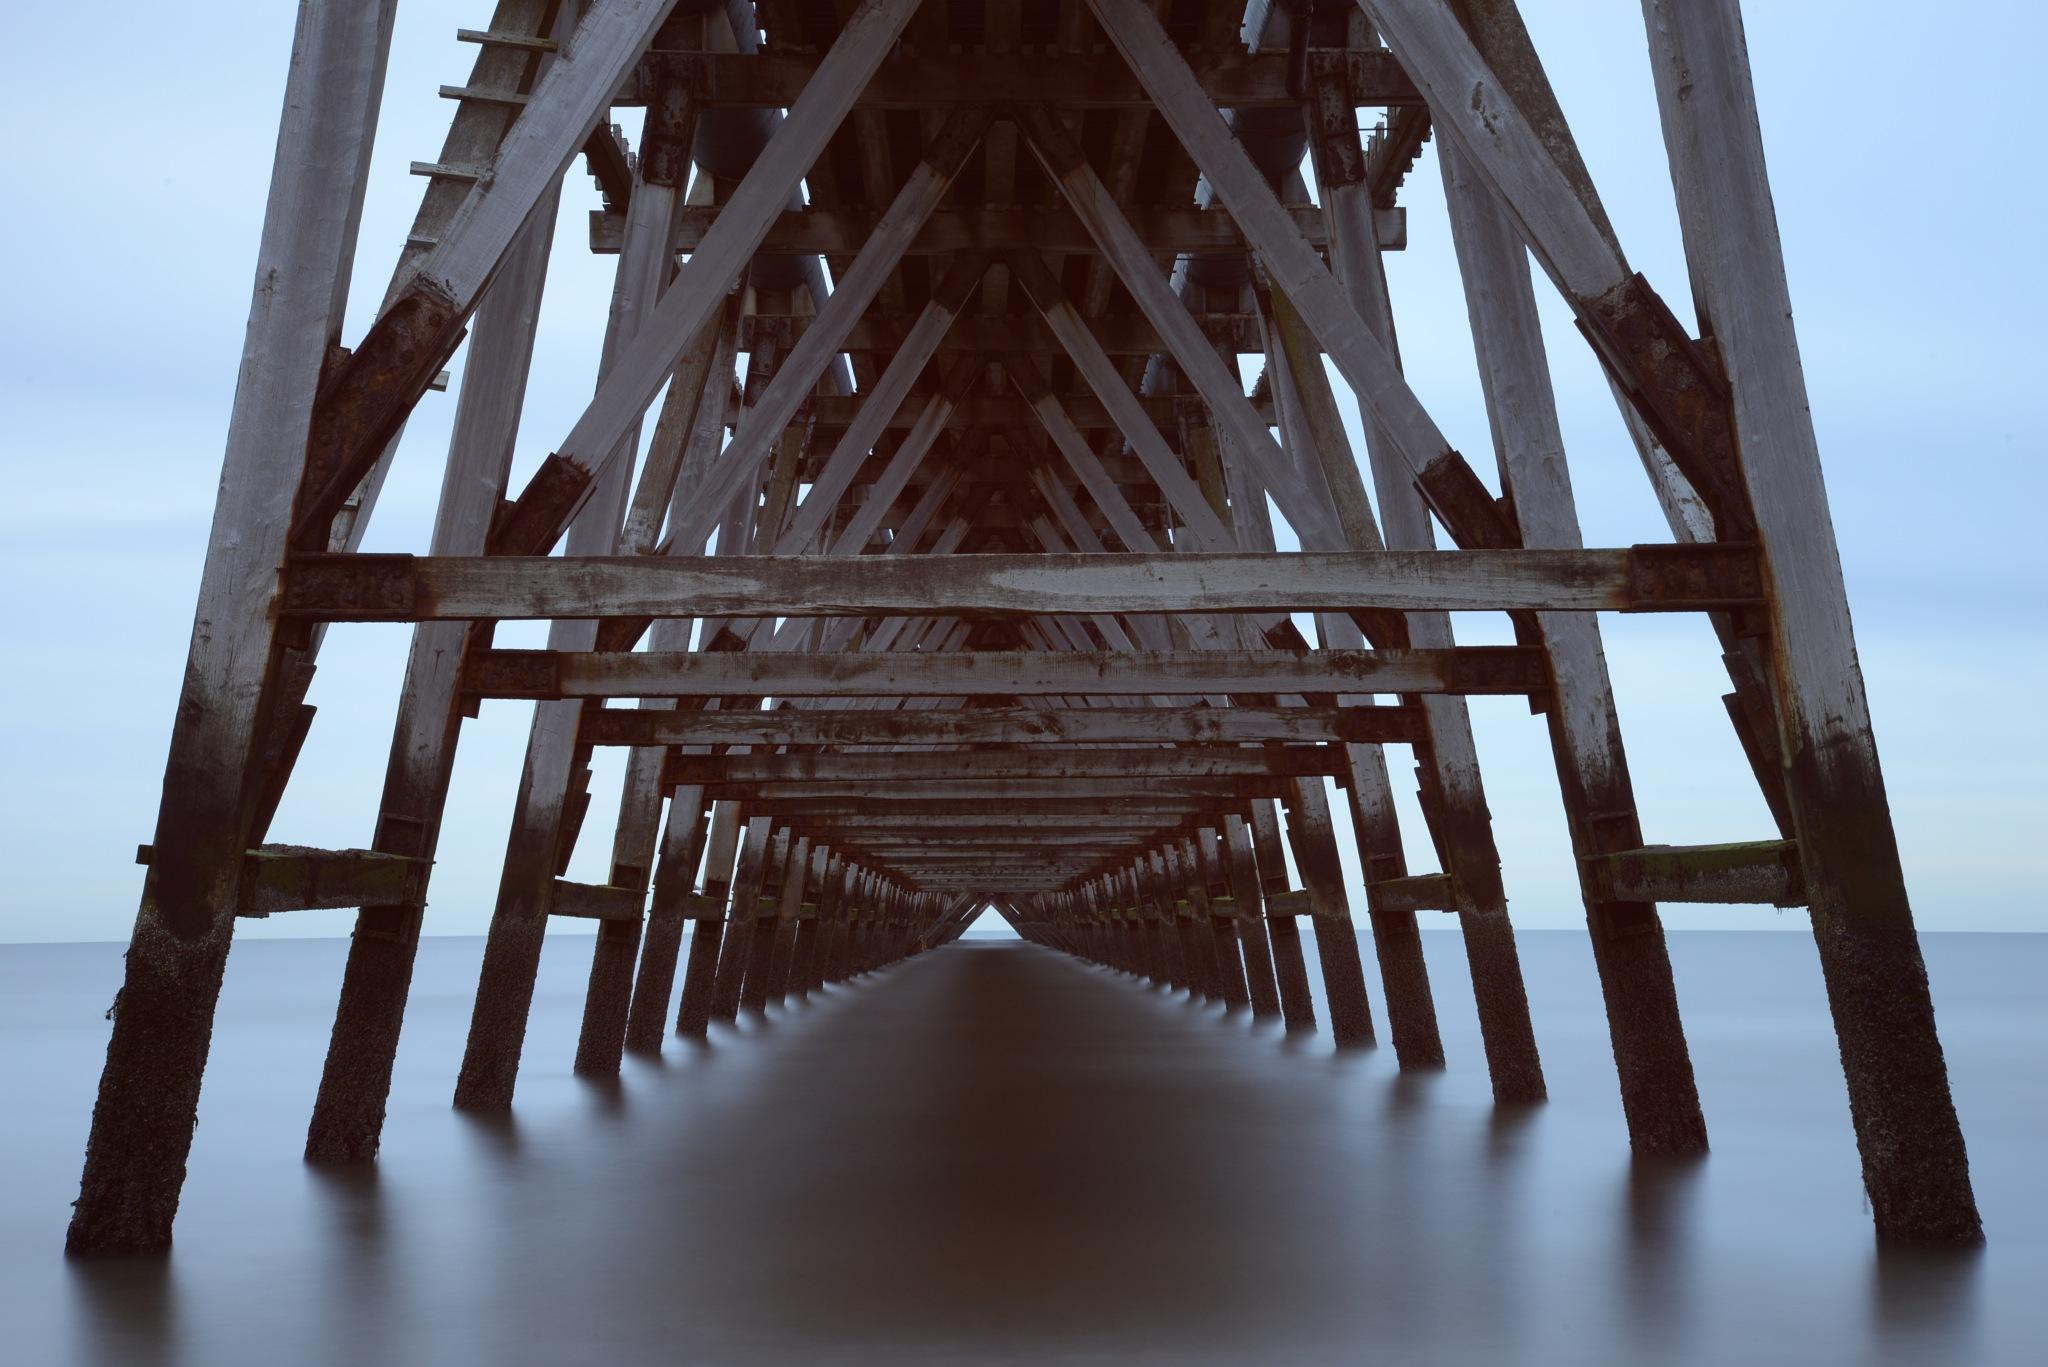 Under the pier by Neil Sheldon